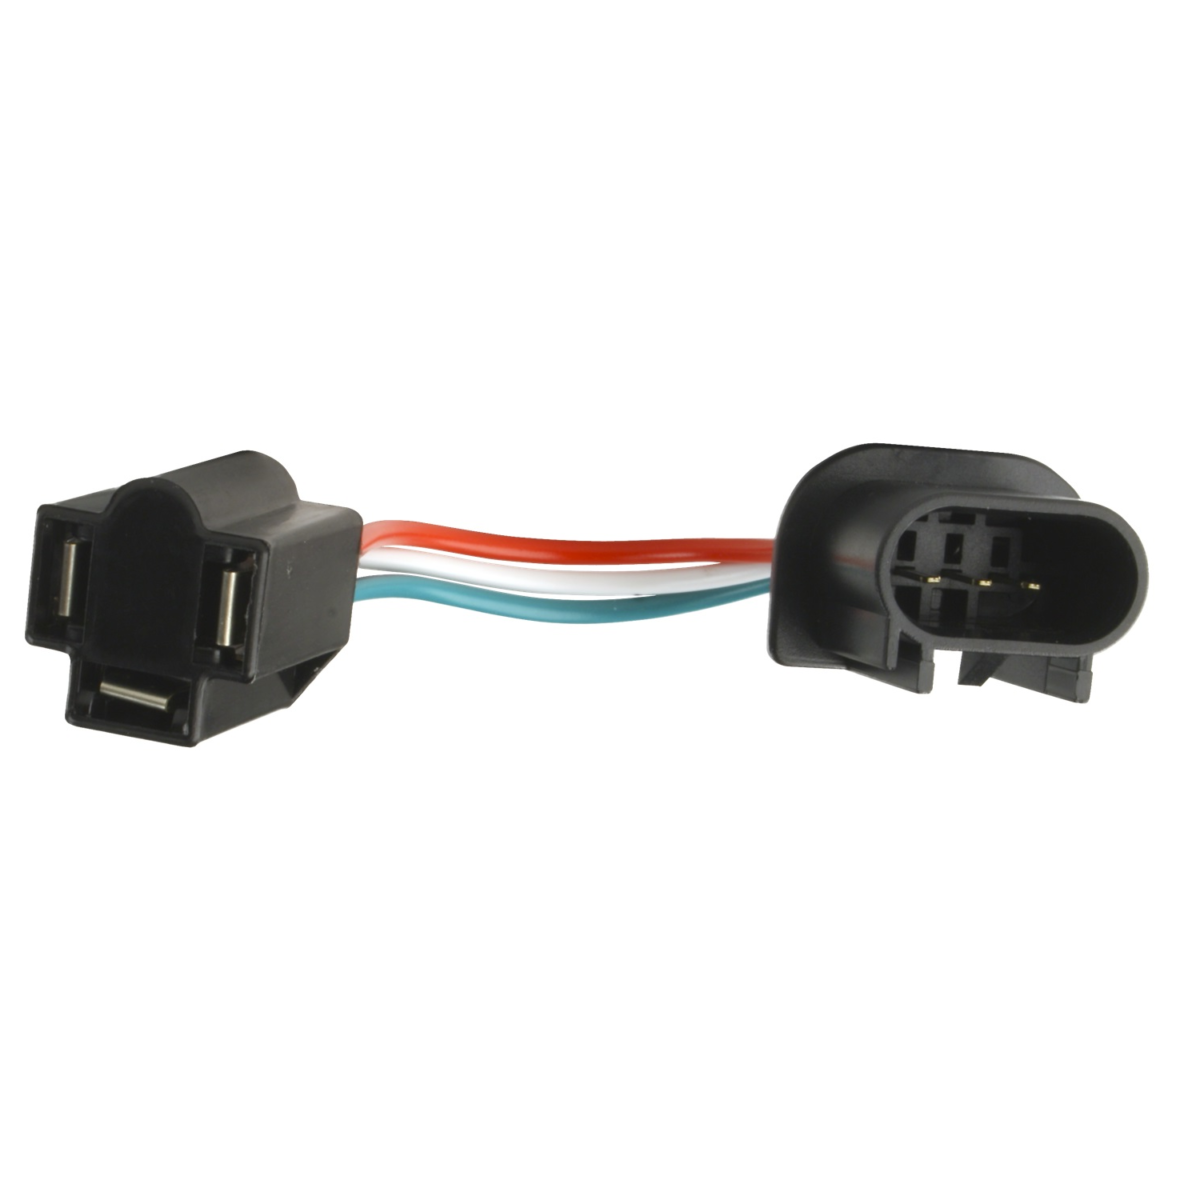 H13 Wiring Diagram Explained Diagrams H4 Headlight Plug To Diy U2022 Harness